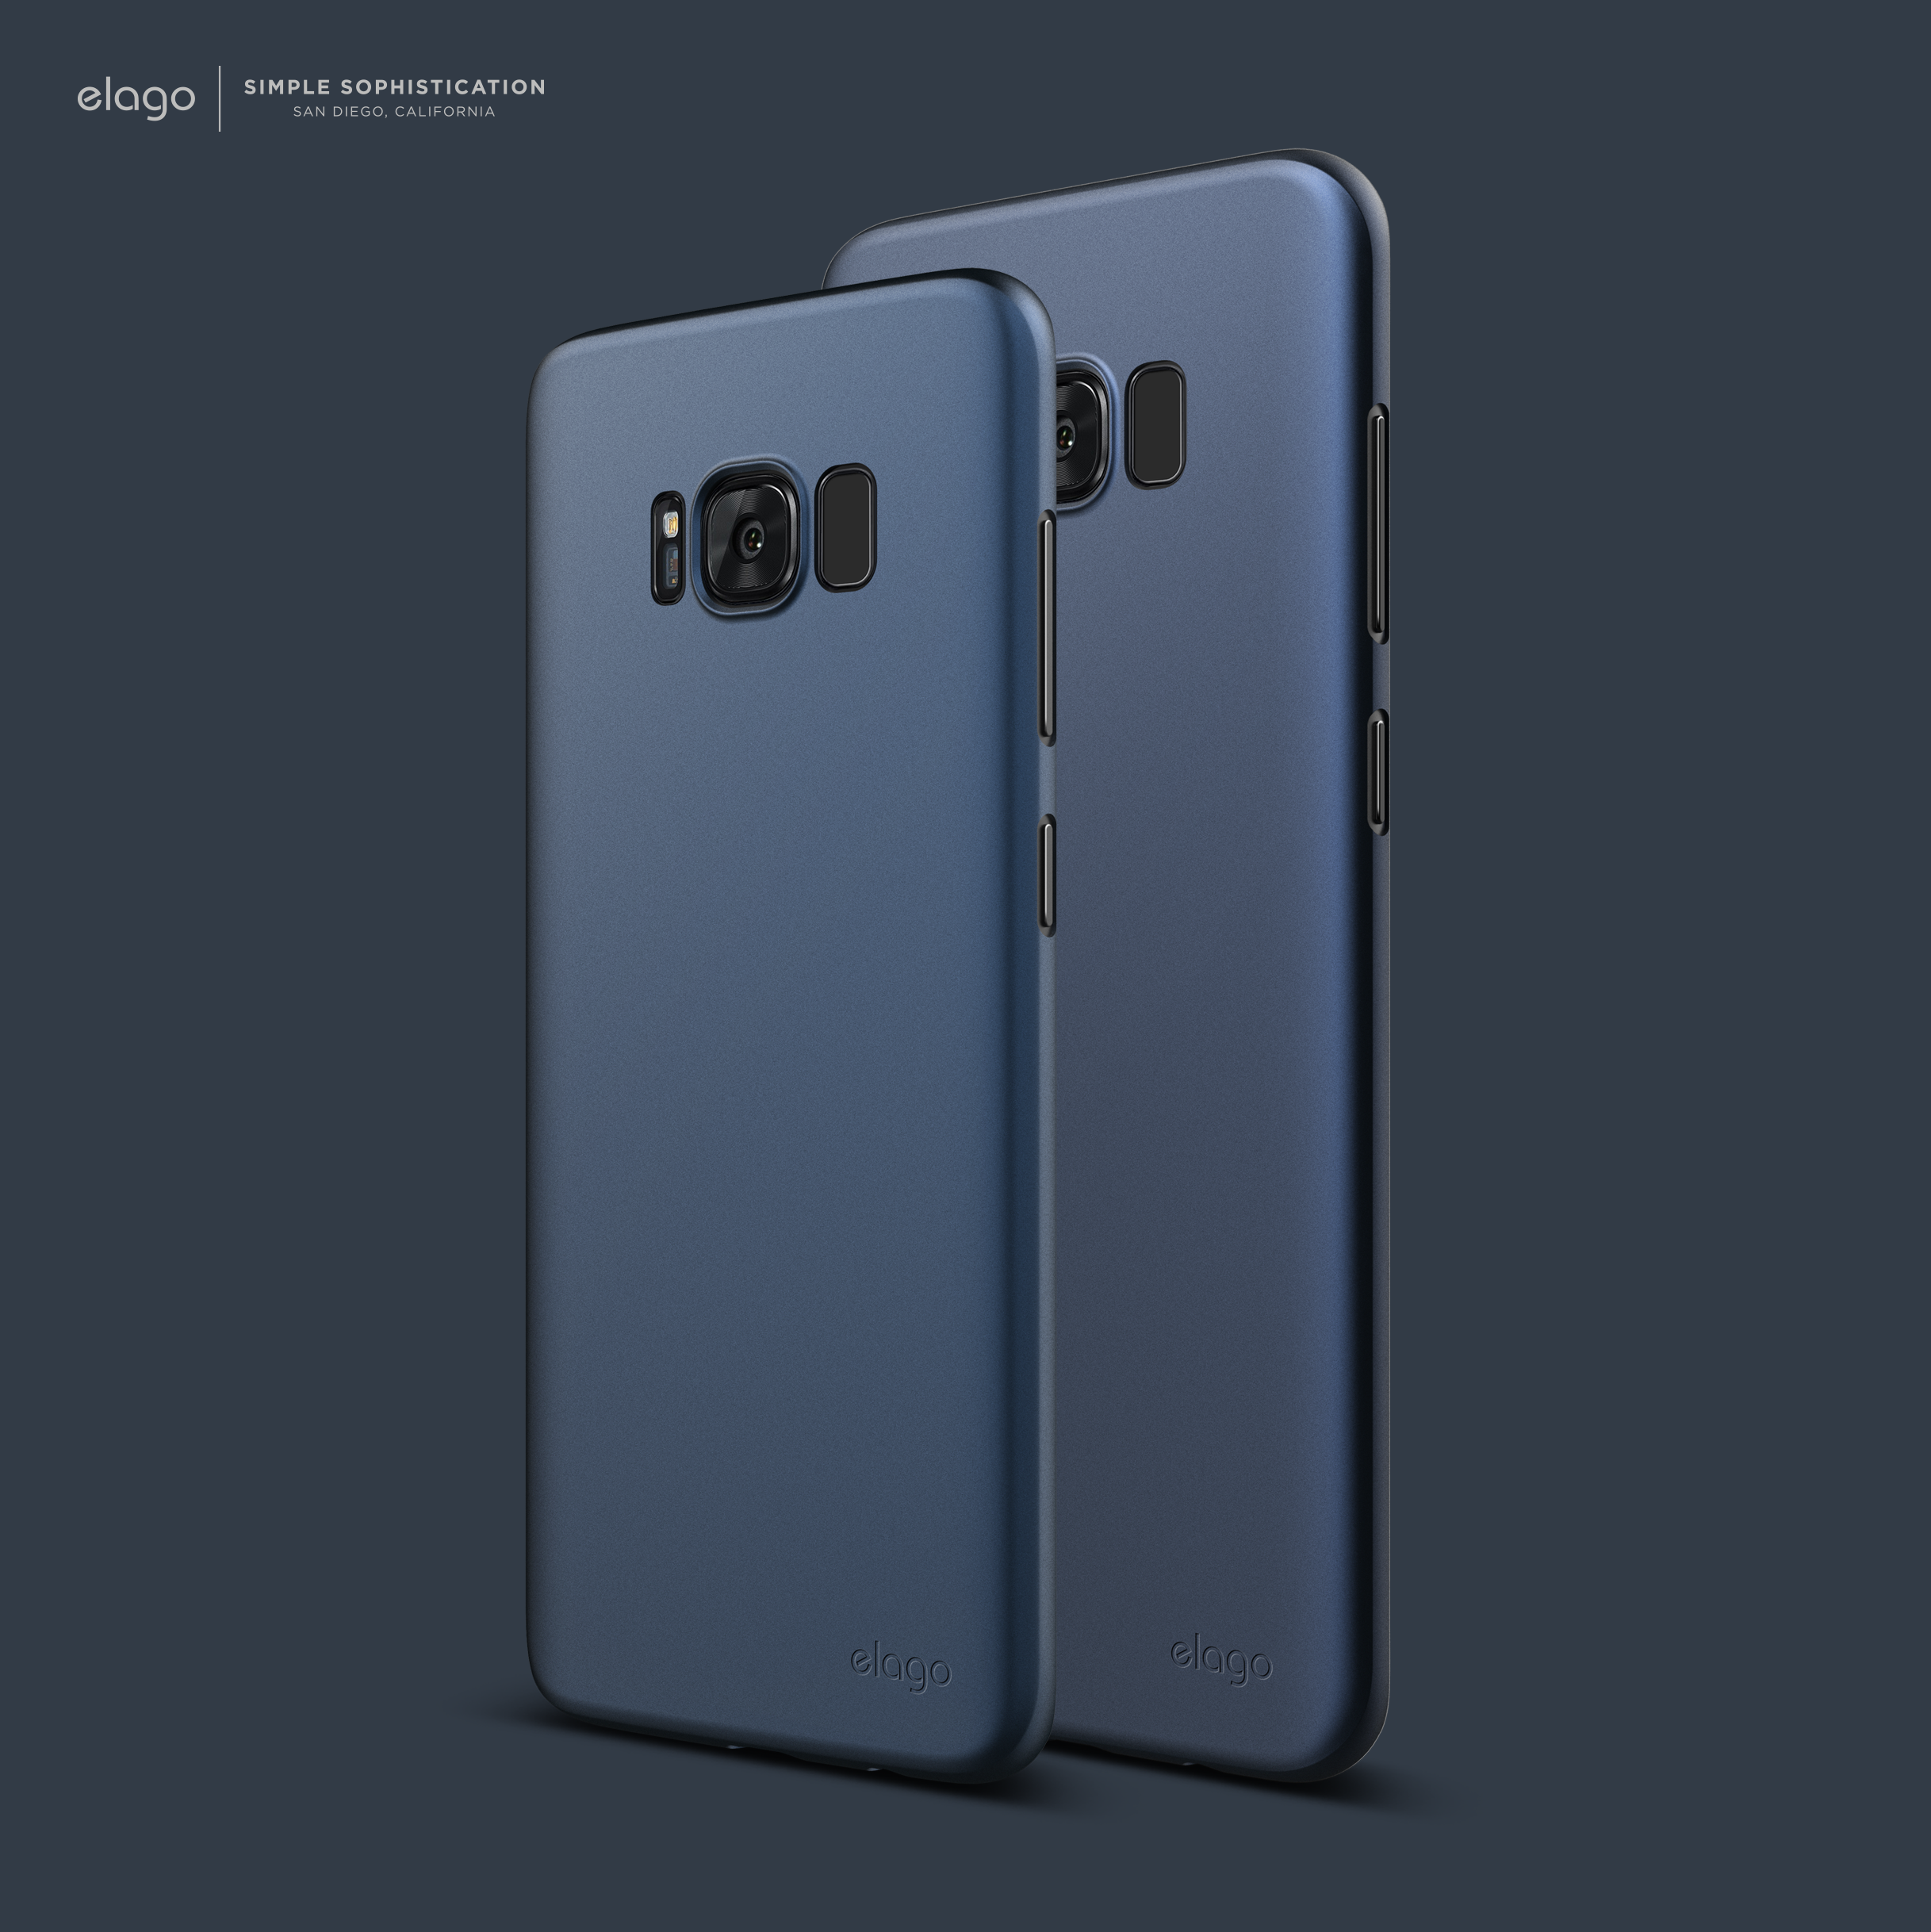 sports shoes 2faeb 0b999 elago Galaxy S8 / Galaxy S8 Plus Origin Case - Jean Indigo. | CASE ...